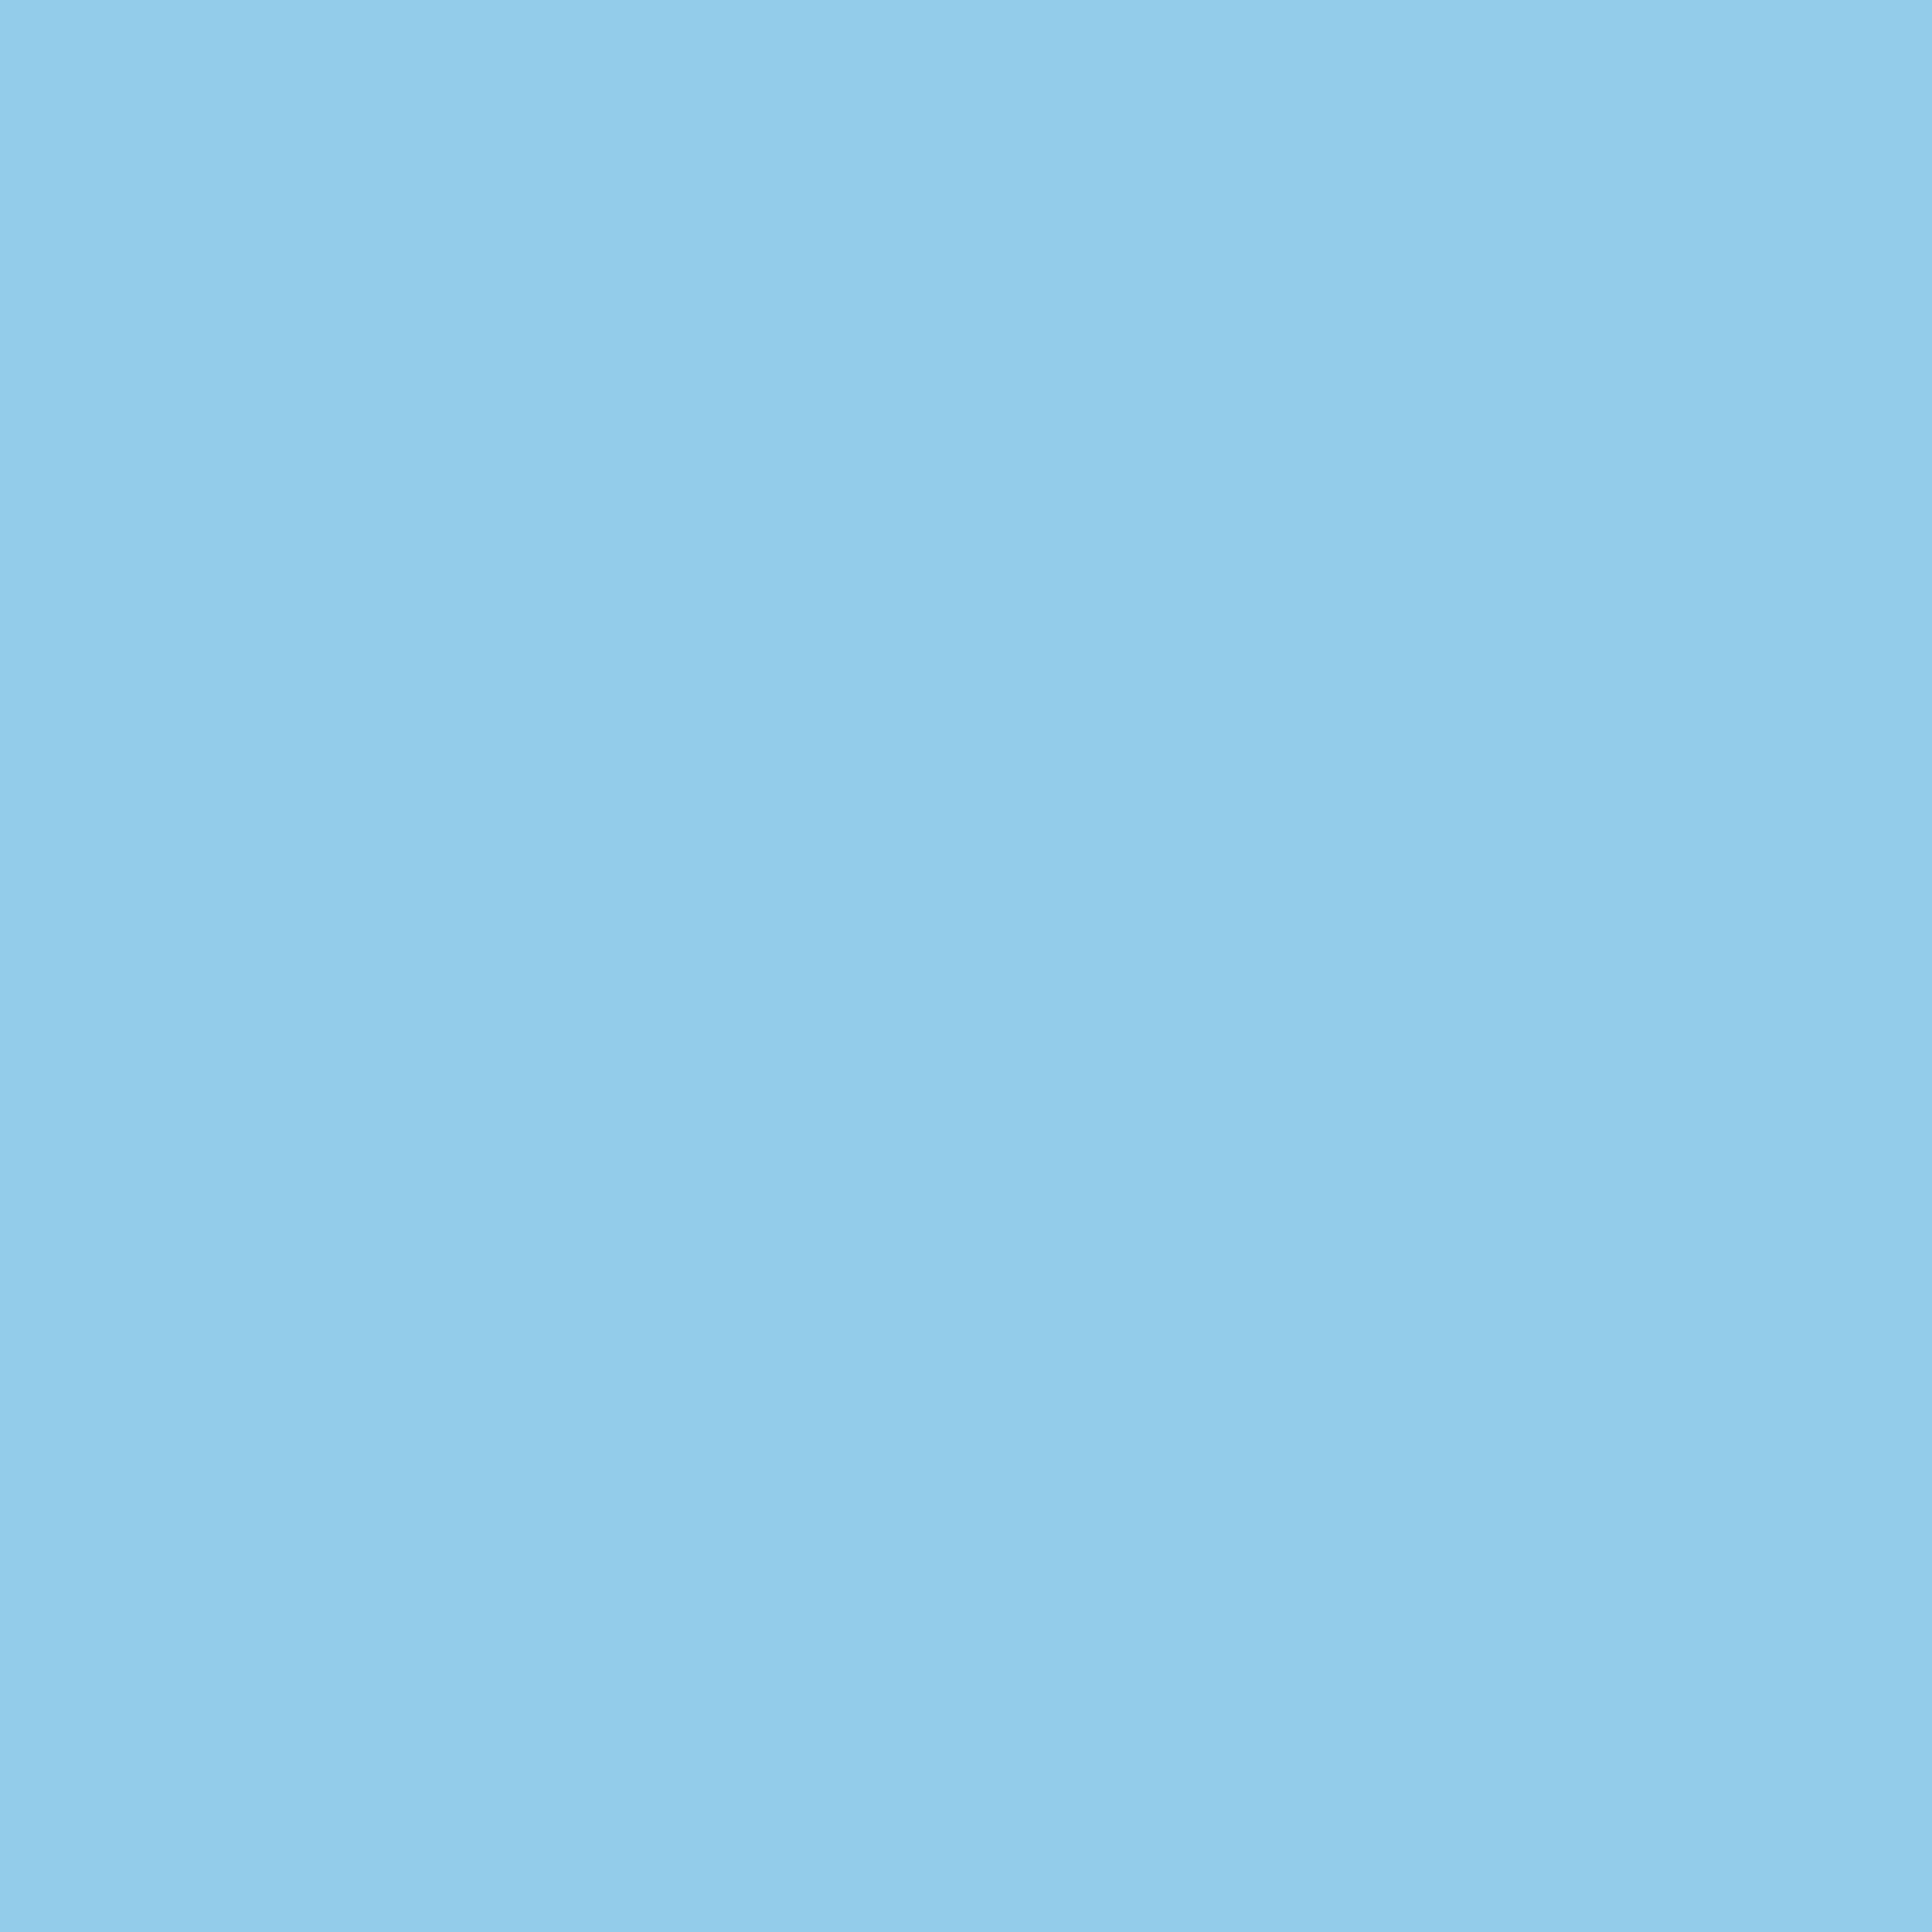 3600x3600 Light Cornflower Blue Solid Color Background